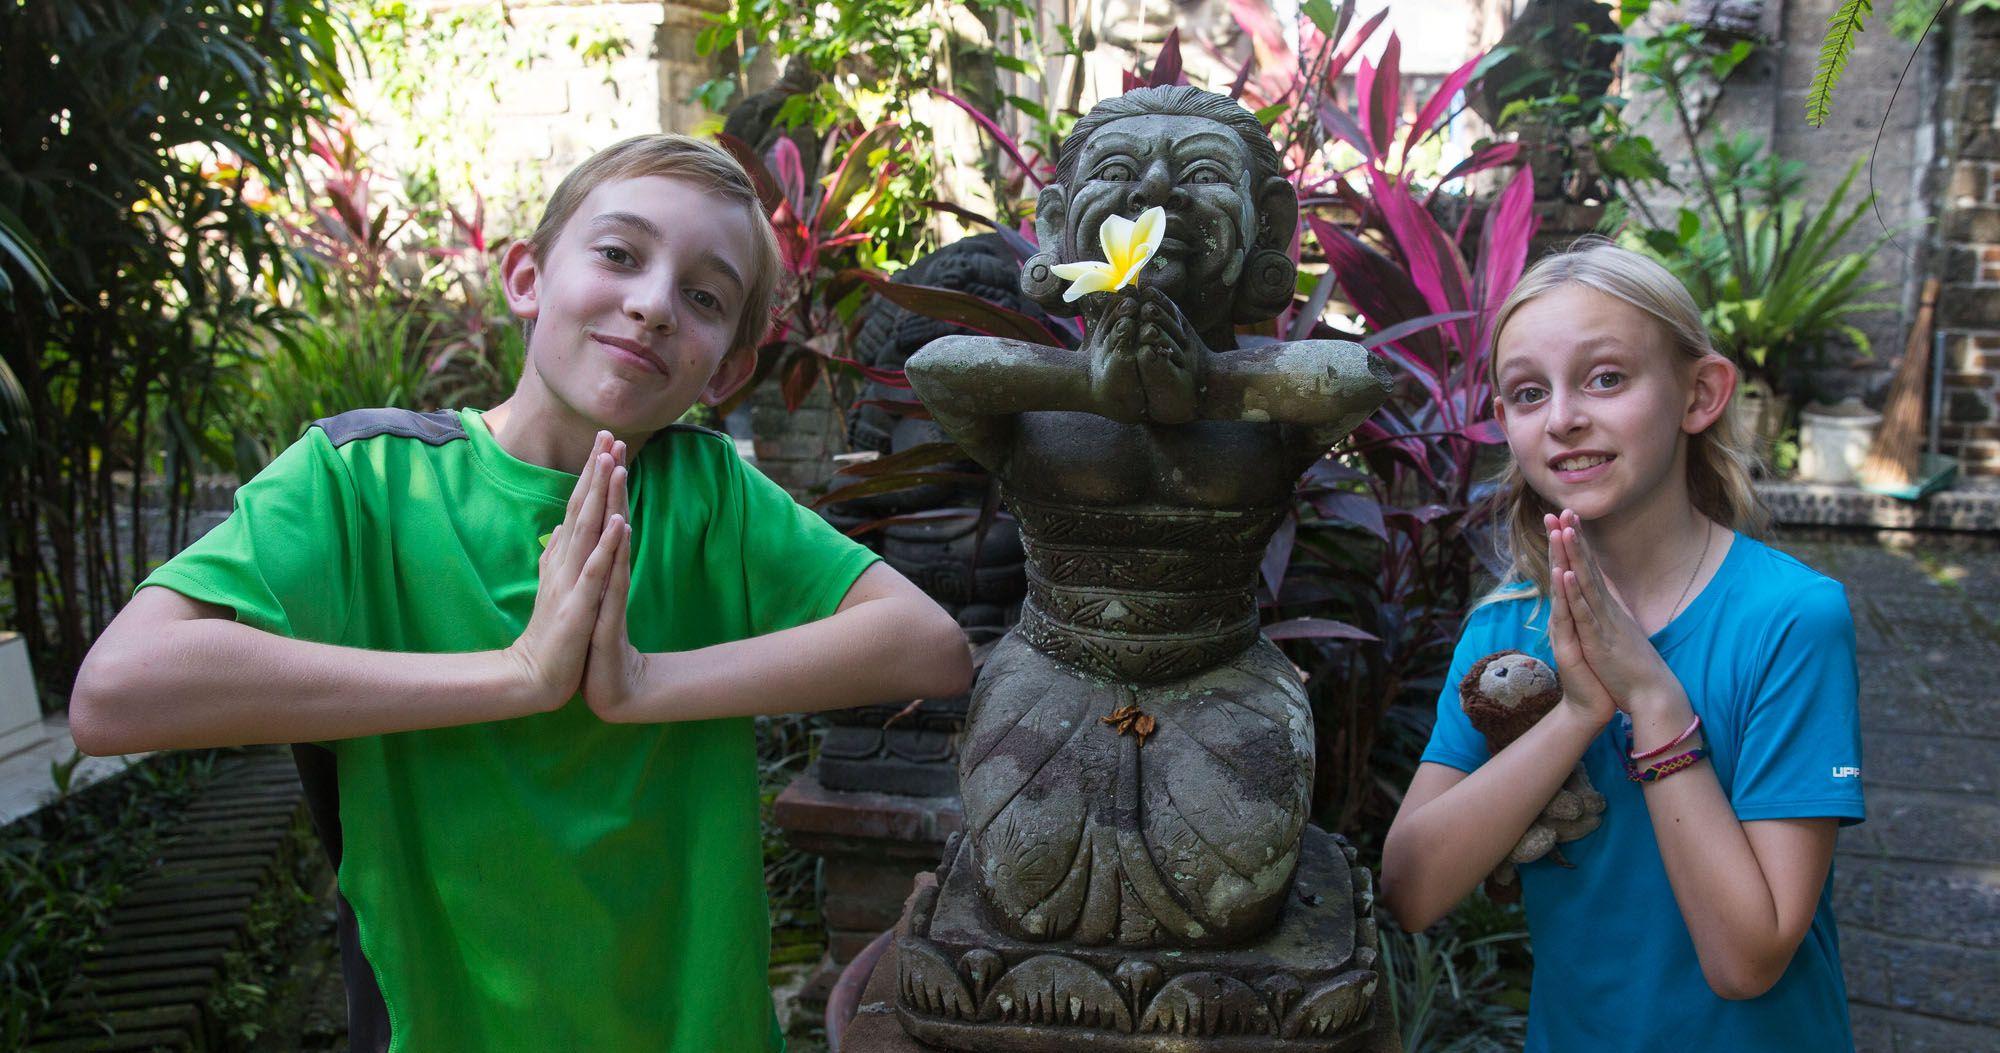 Tyler and Kara Bali